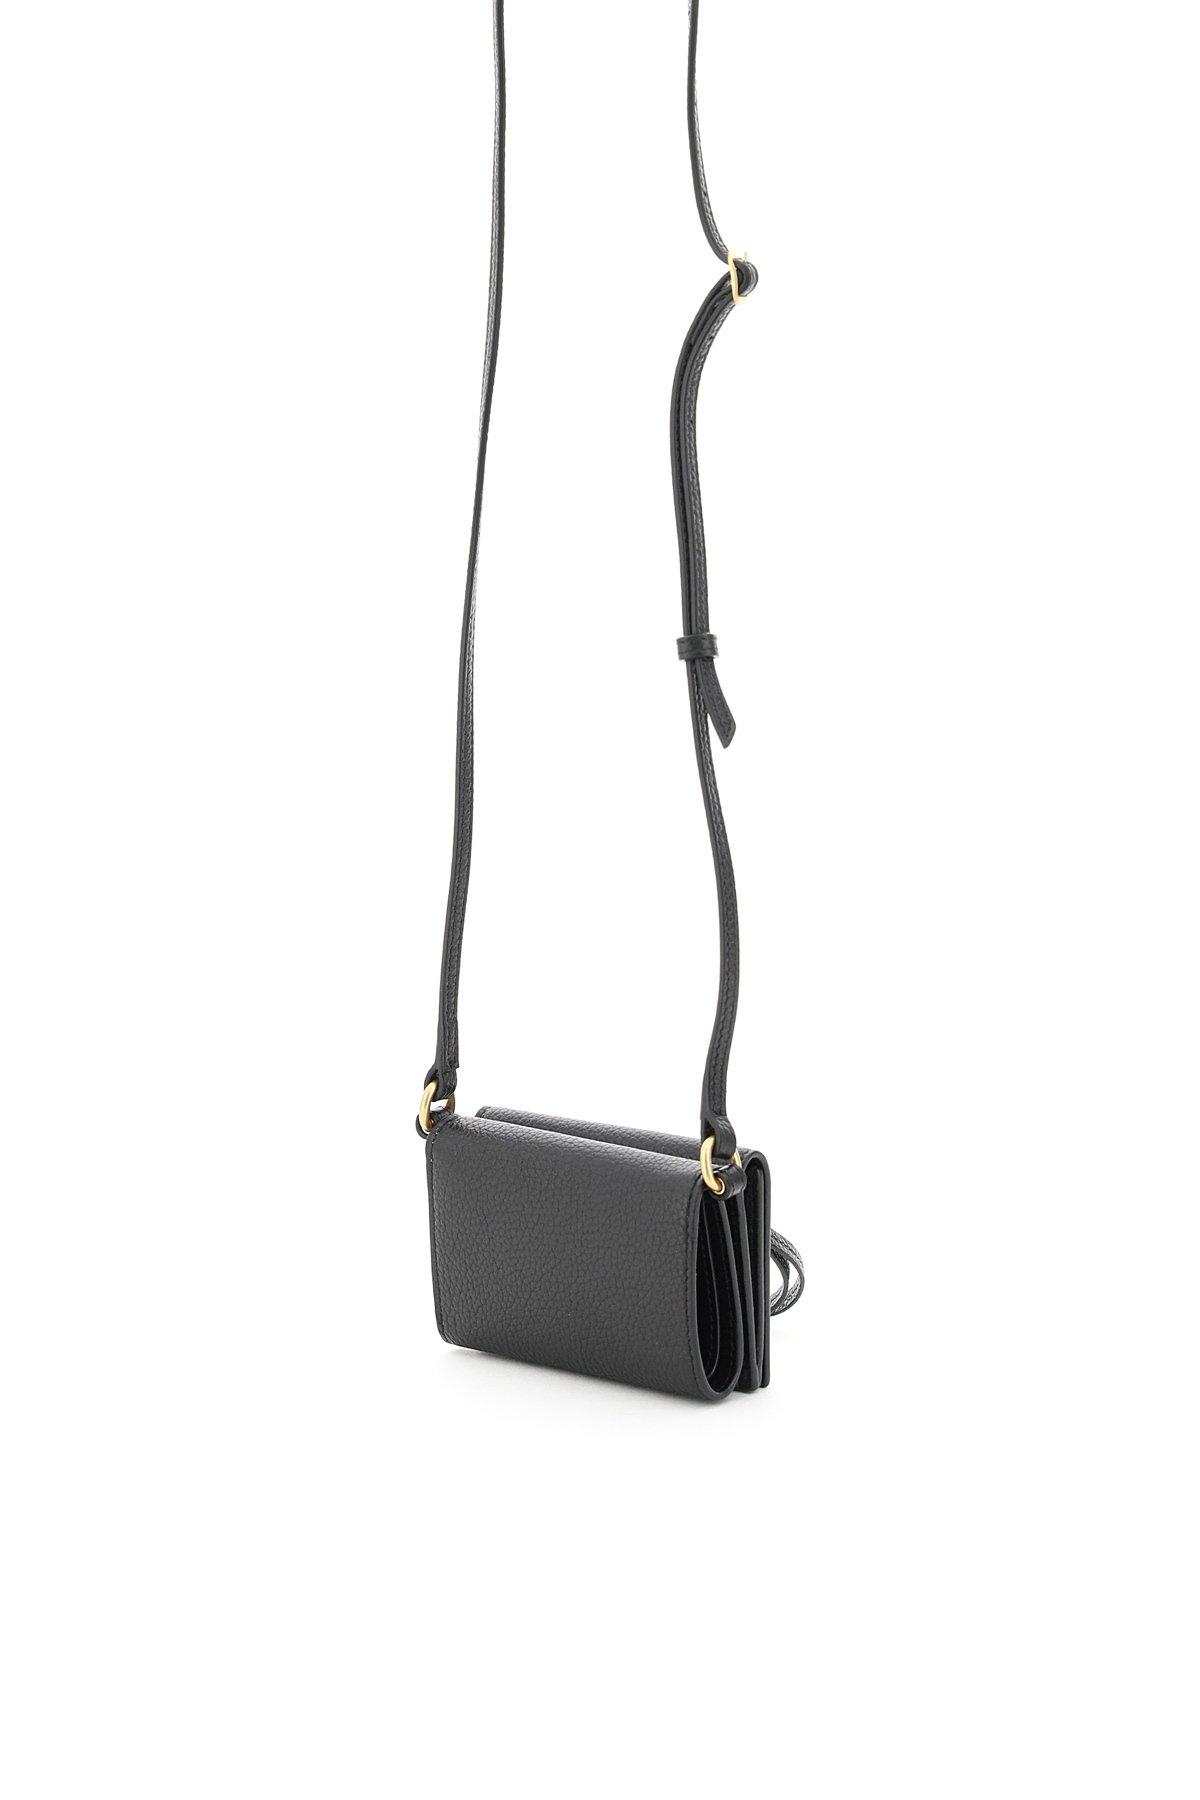 Balenciaga micro bag neo classic mini wallet